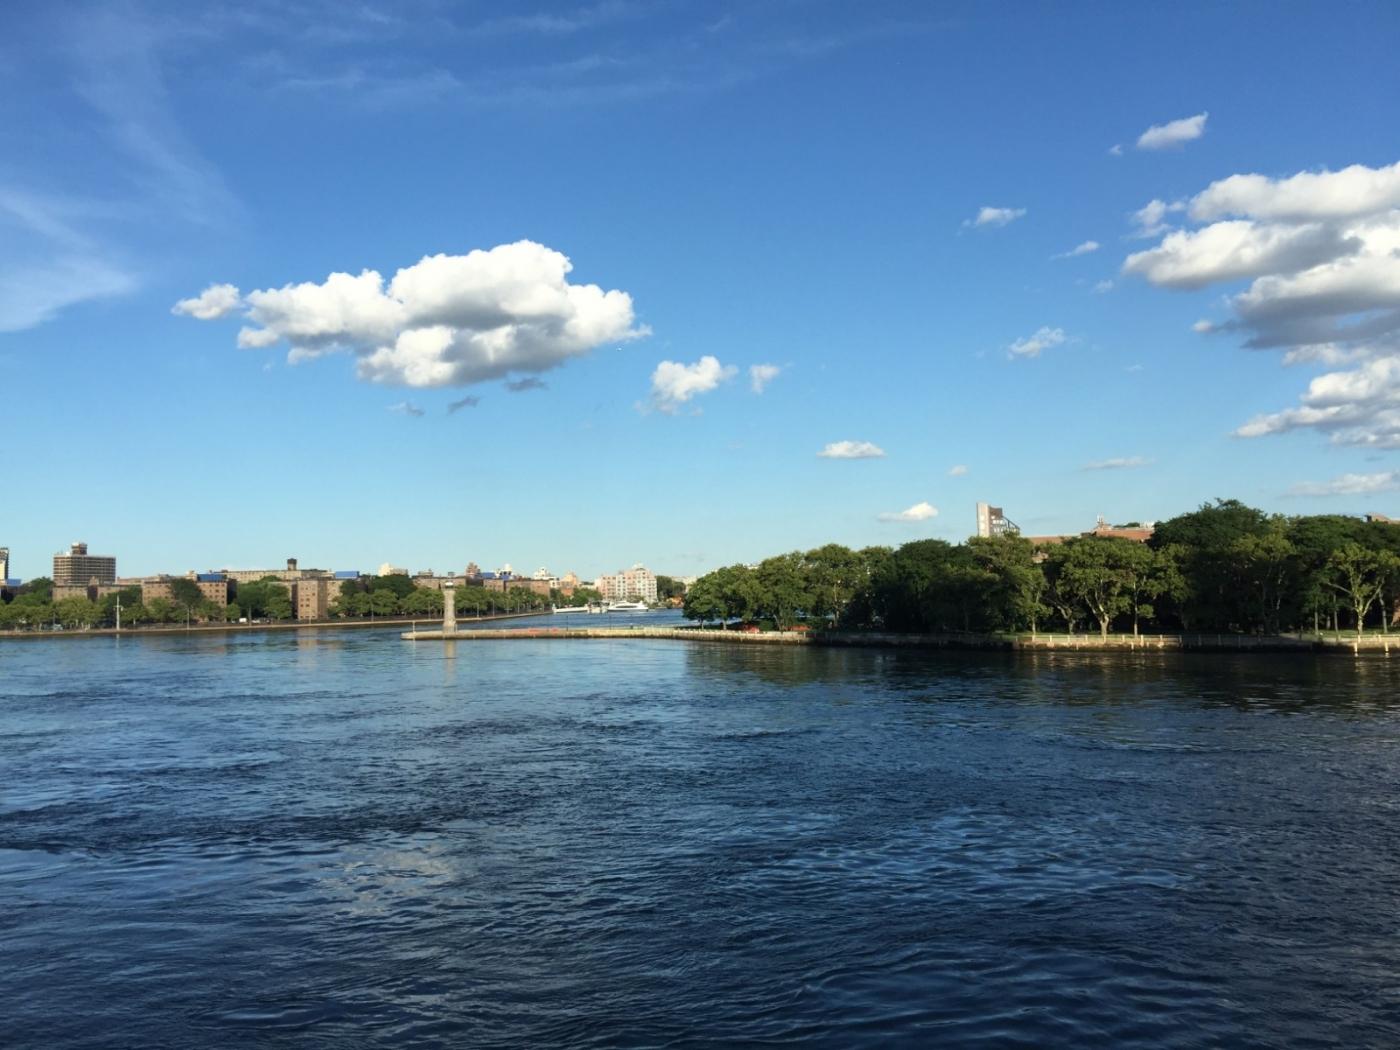 回头一瞅 美在东河 Manhattan East River_图1-6